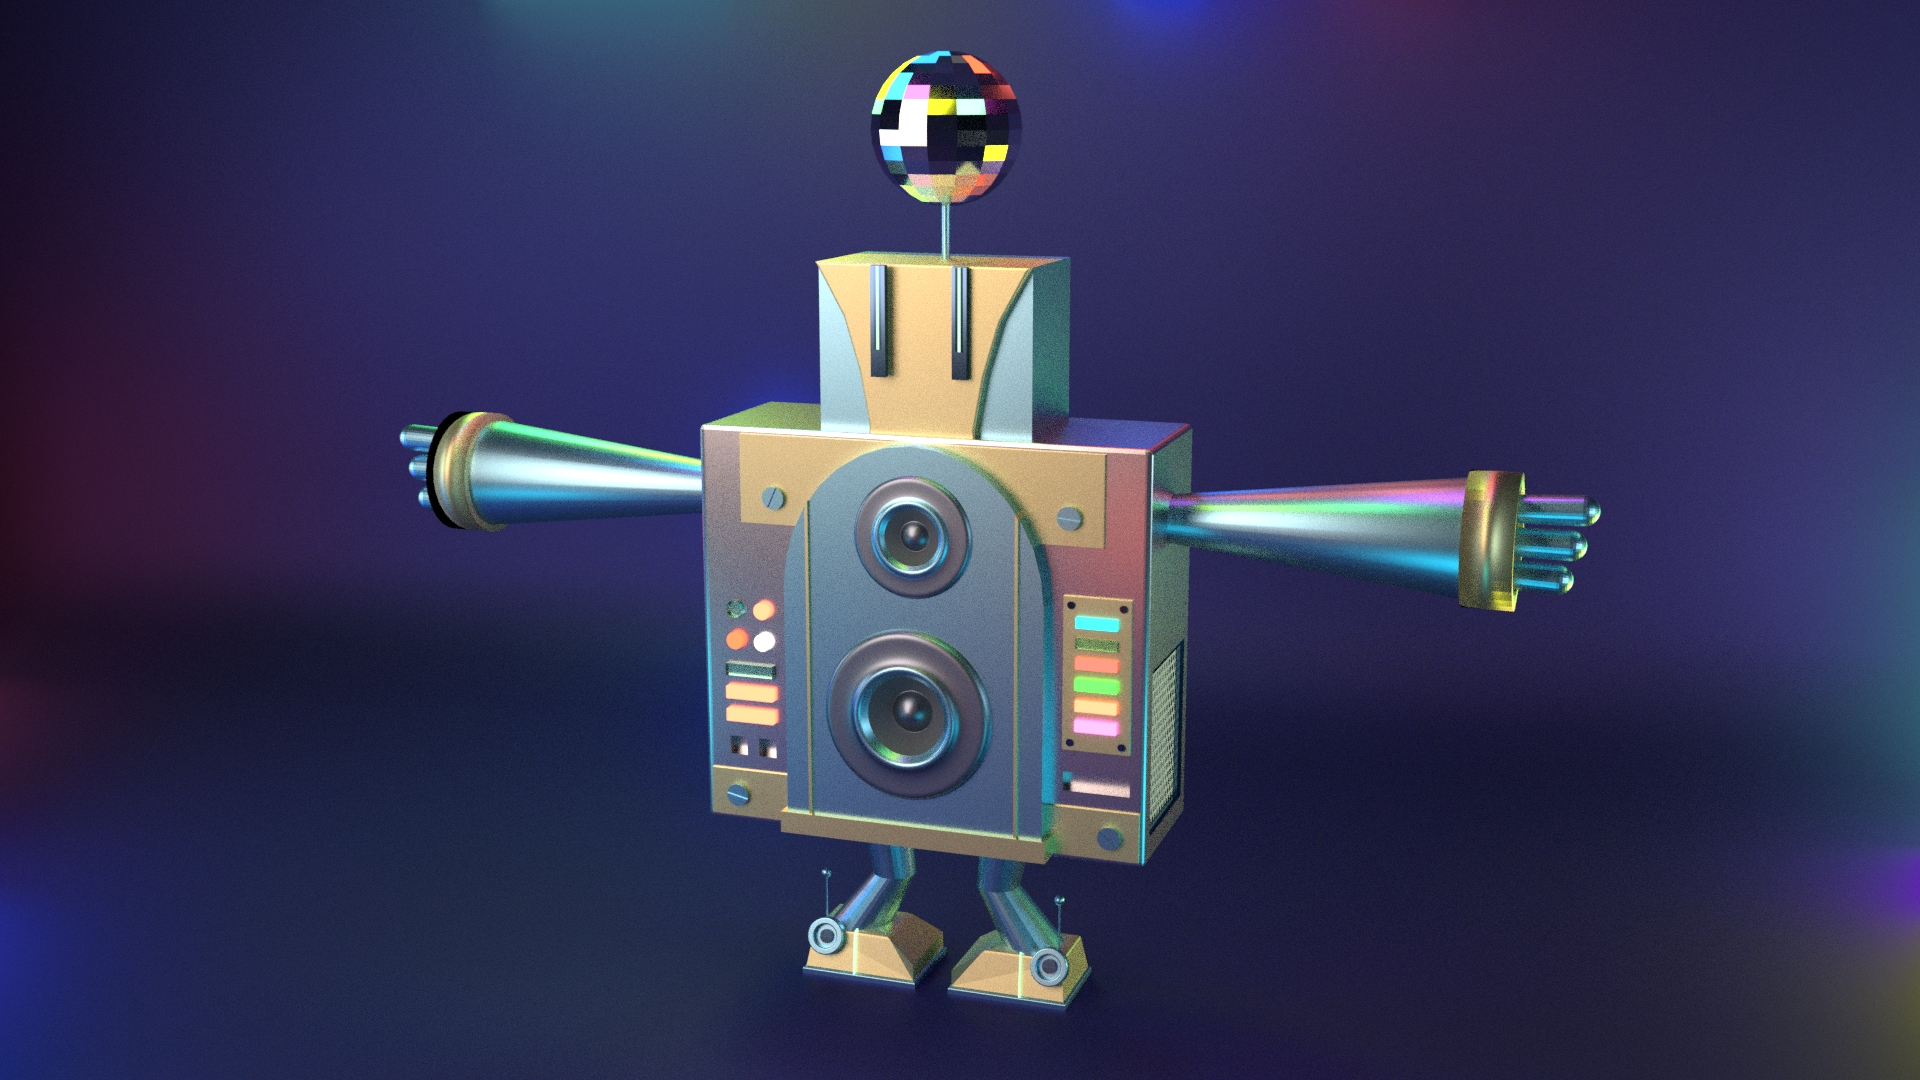 disco_robot_dev2_render.jpg